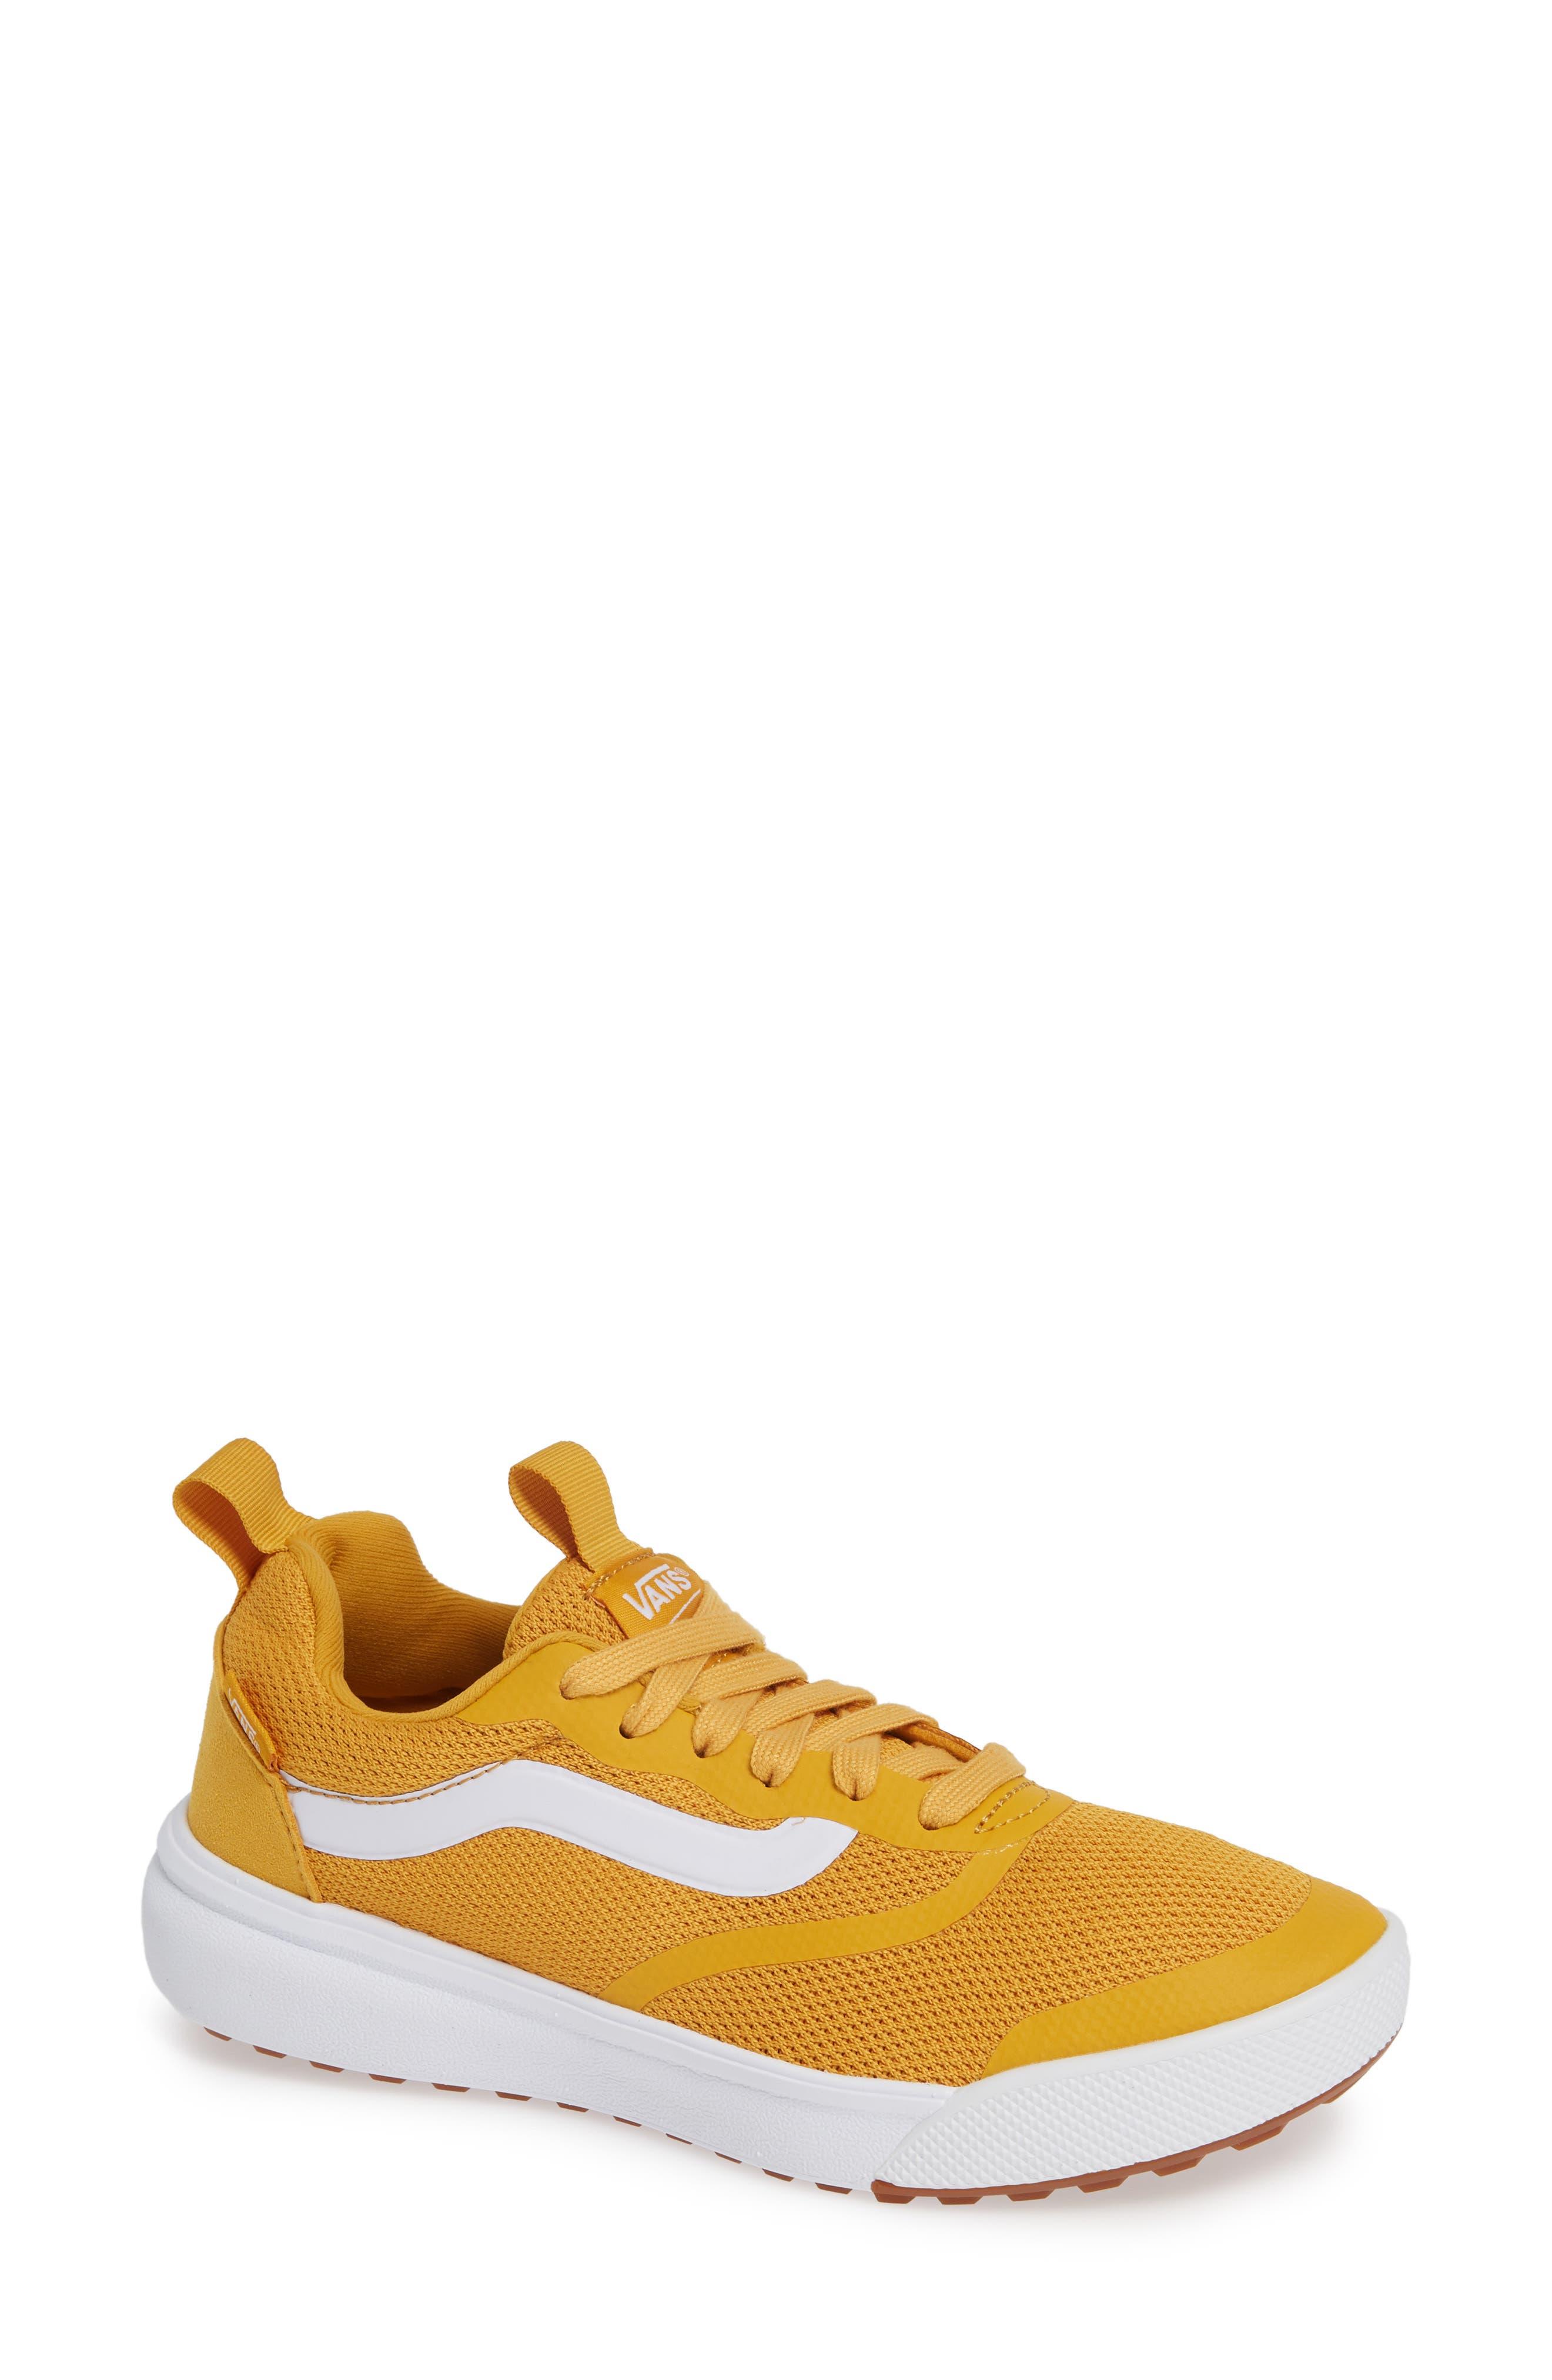 Shop Vans Ultrarange Rapidweld Sneaker